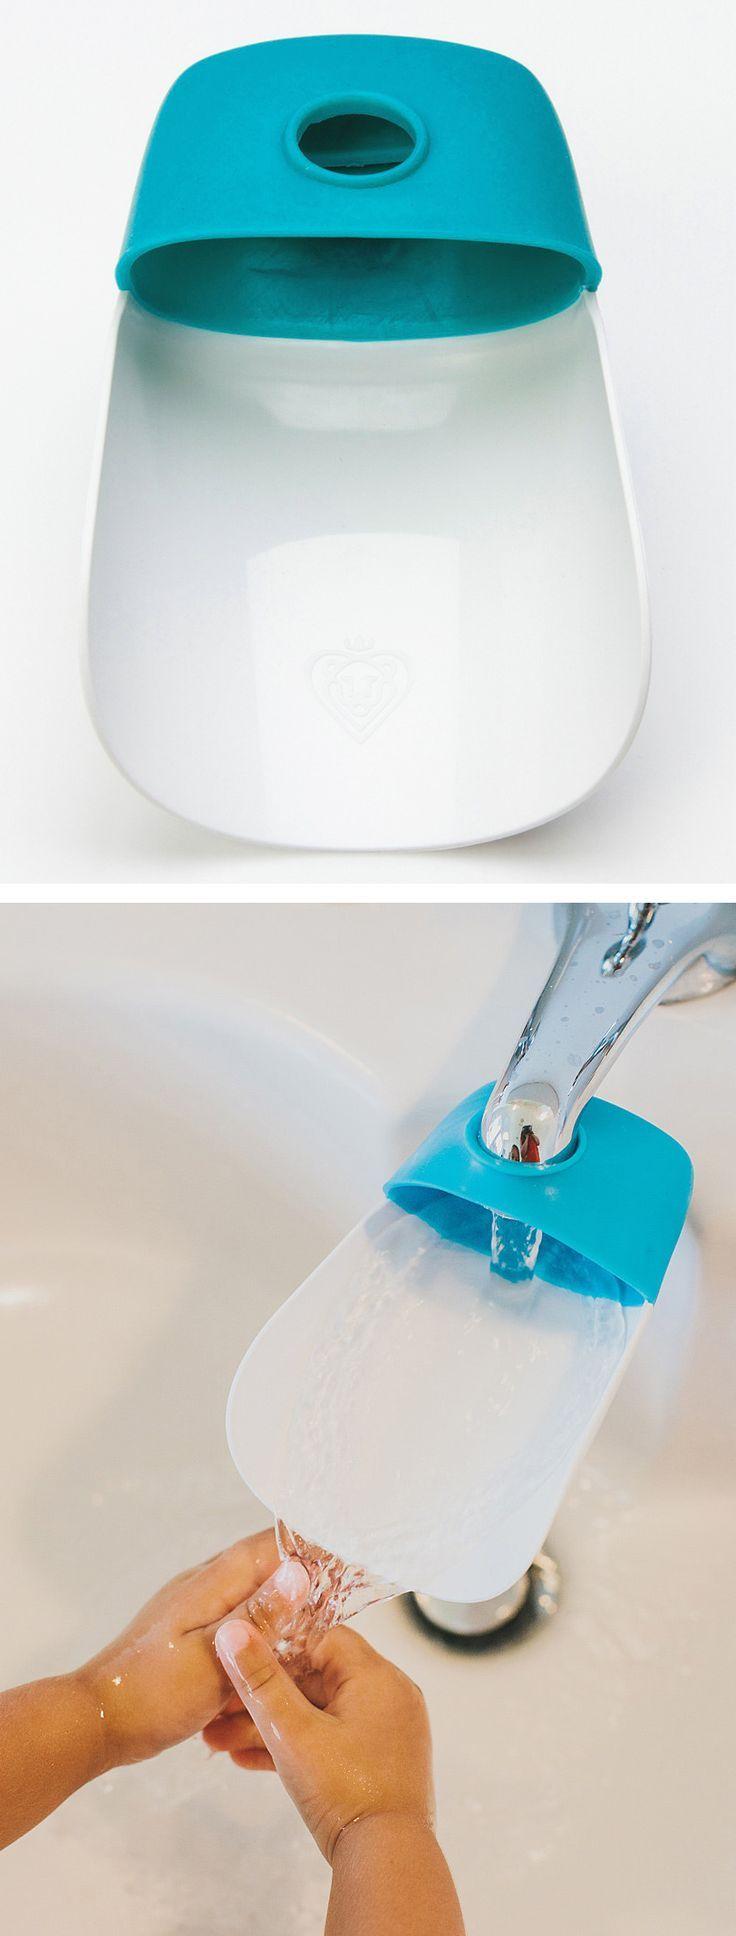 Universal Faucet Extender For Little Hands // SO cUte!